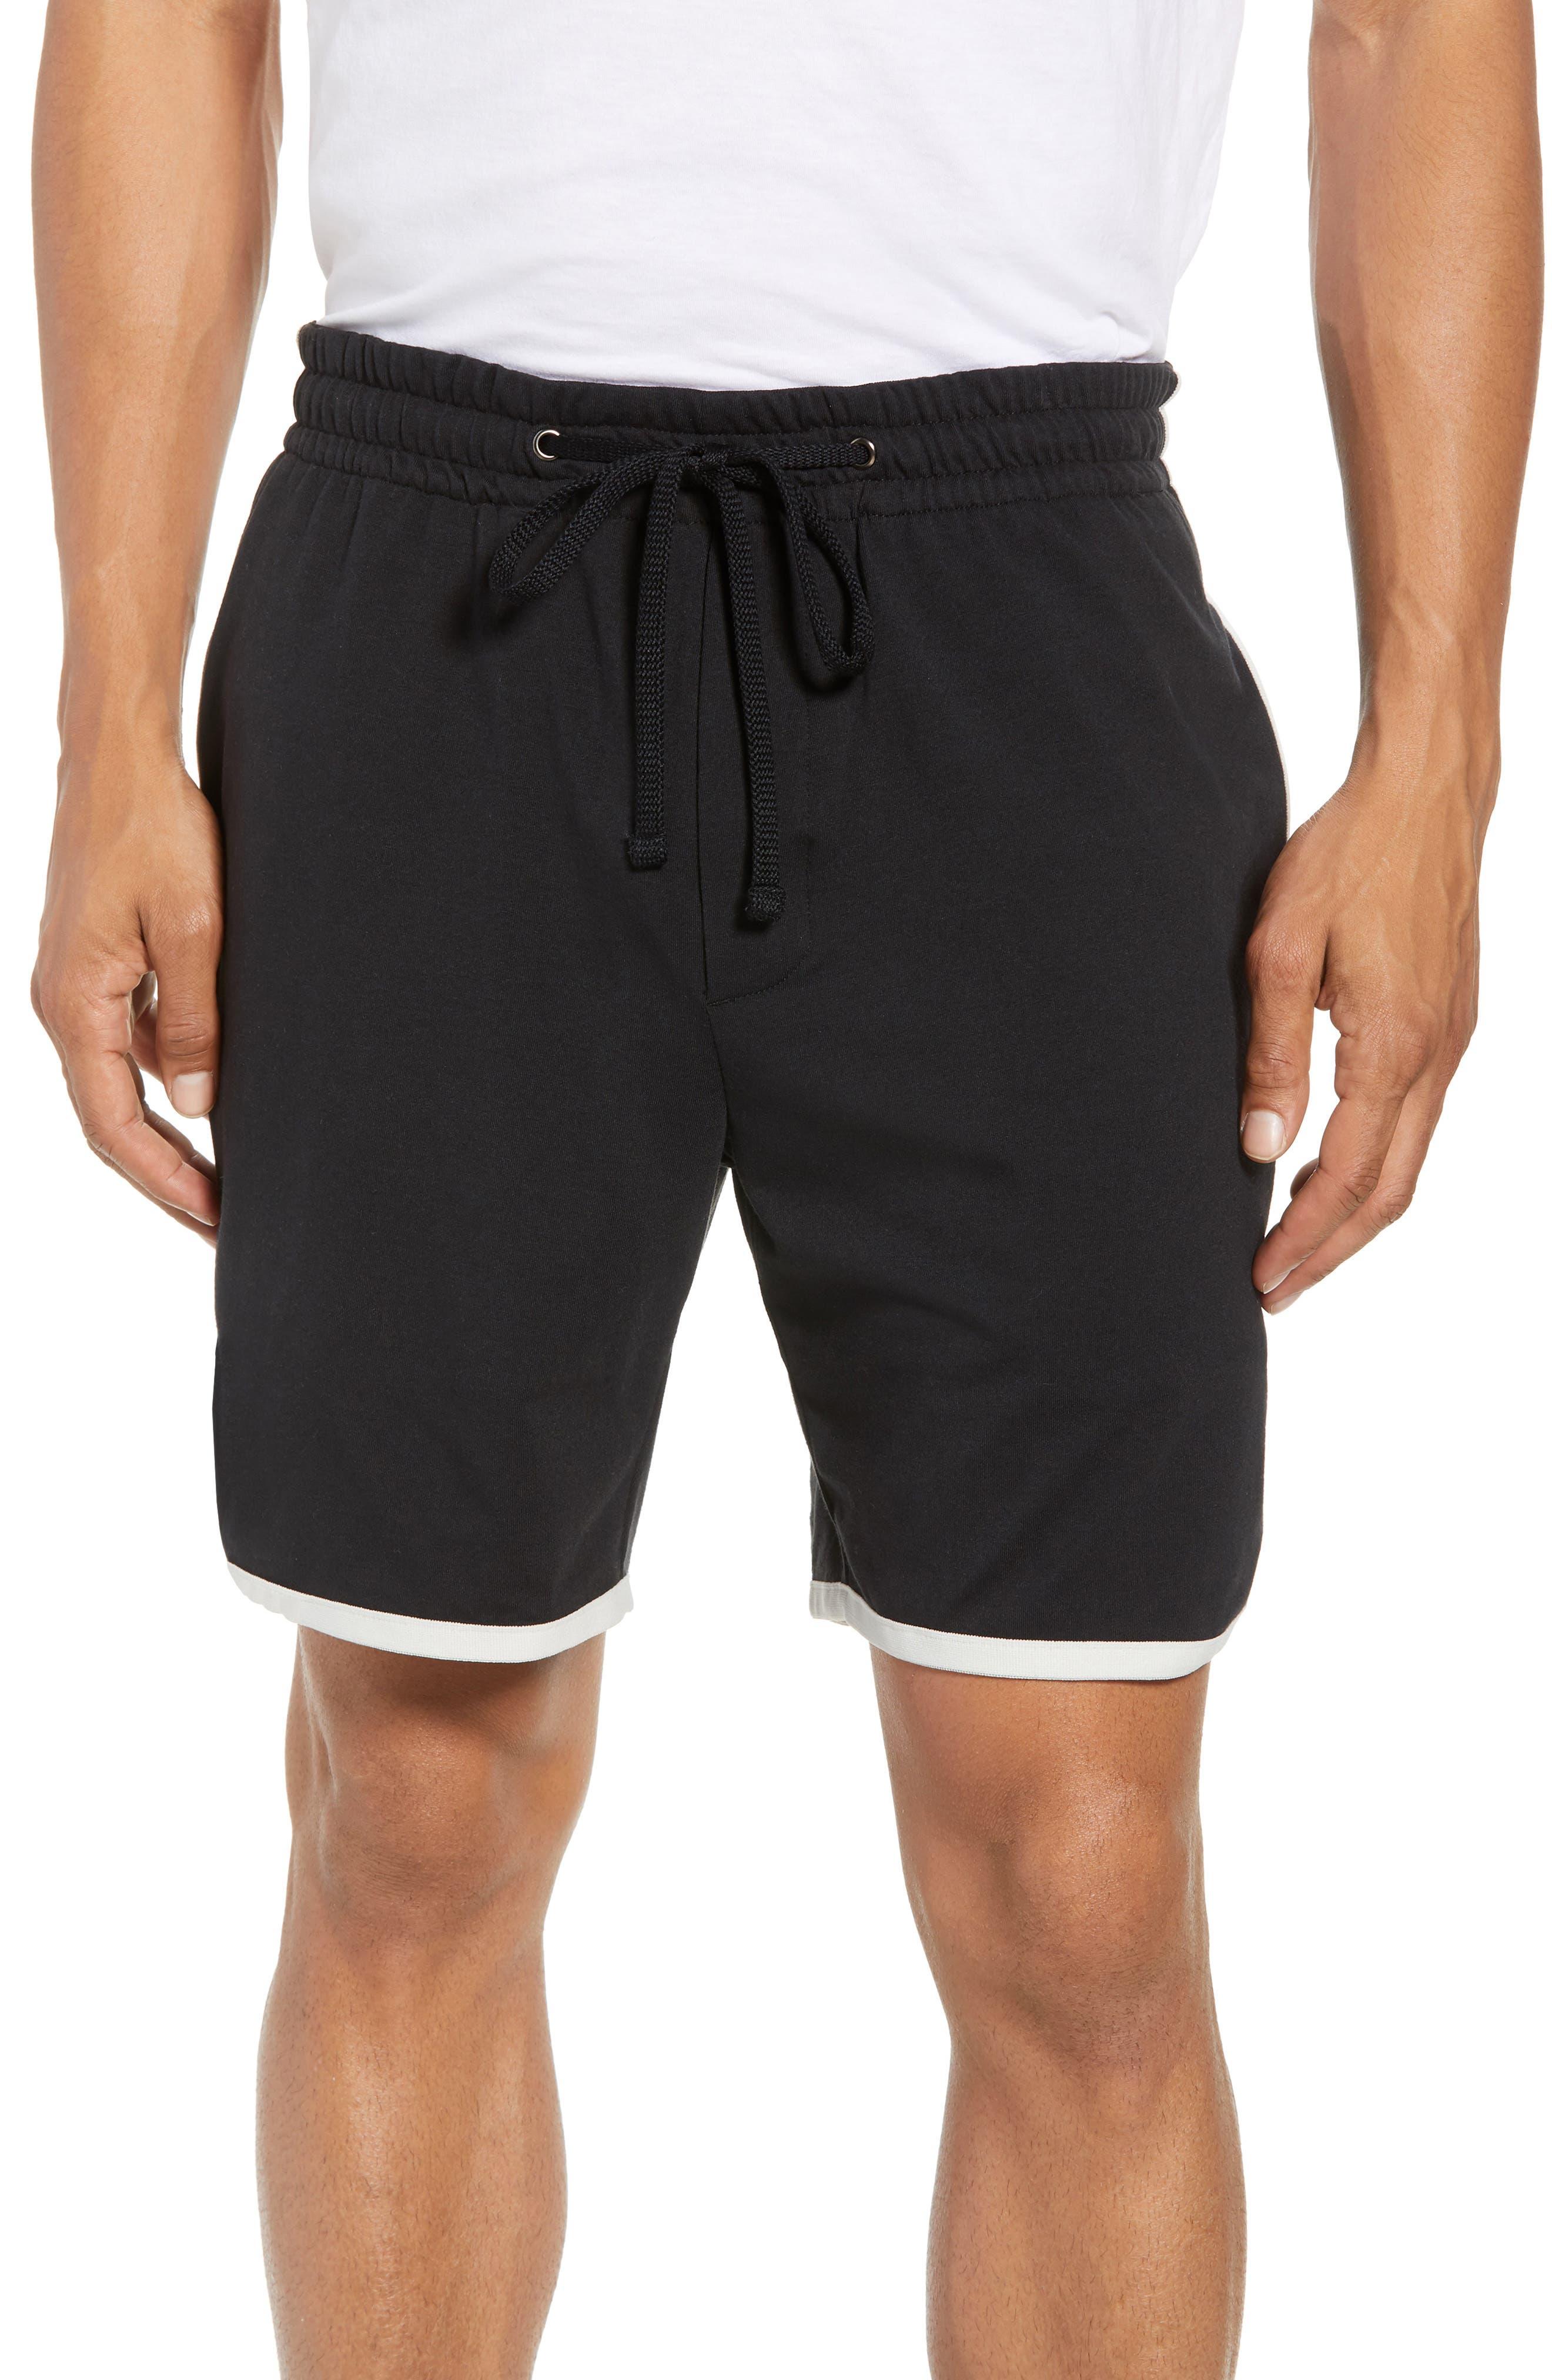 Vintage Regular Fit Gym Shorts,                             Main thumbnail 1, color,                             001